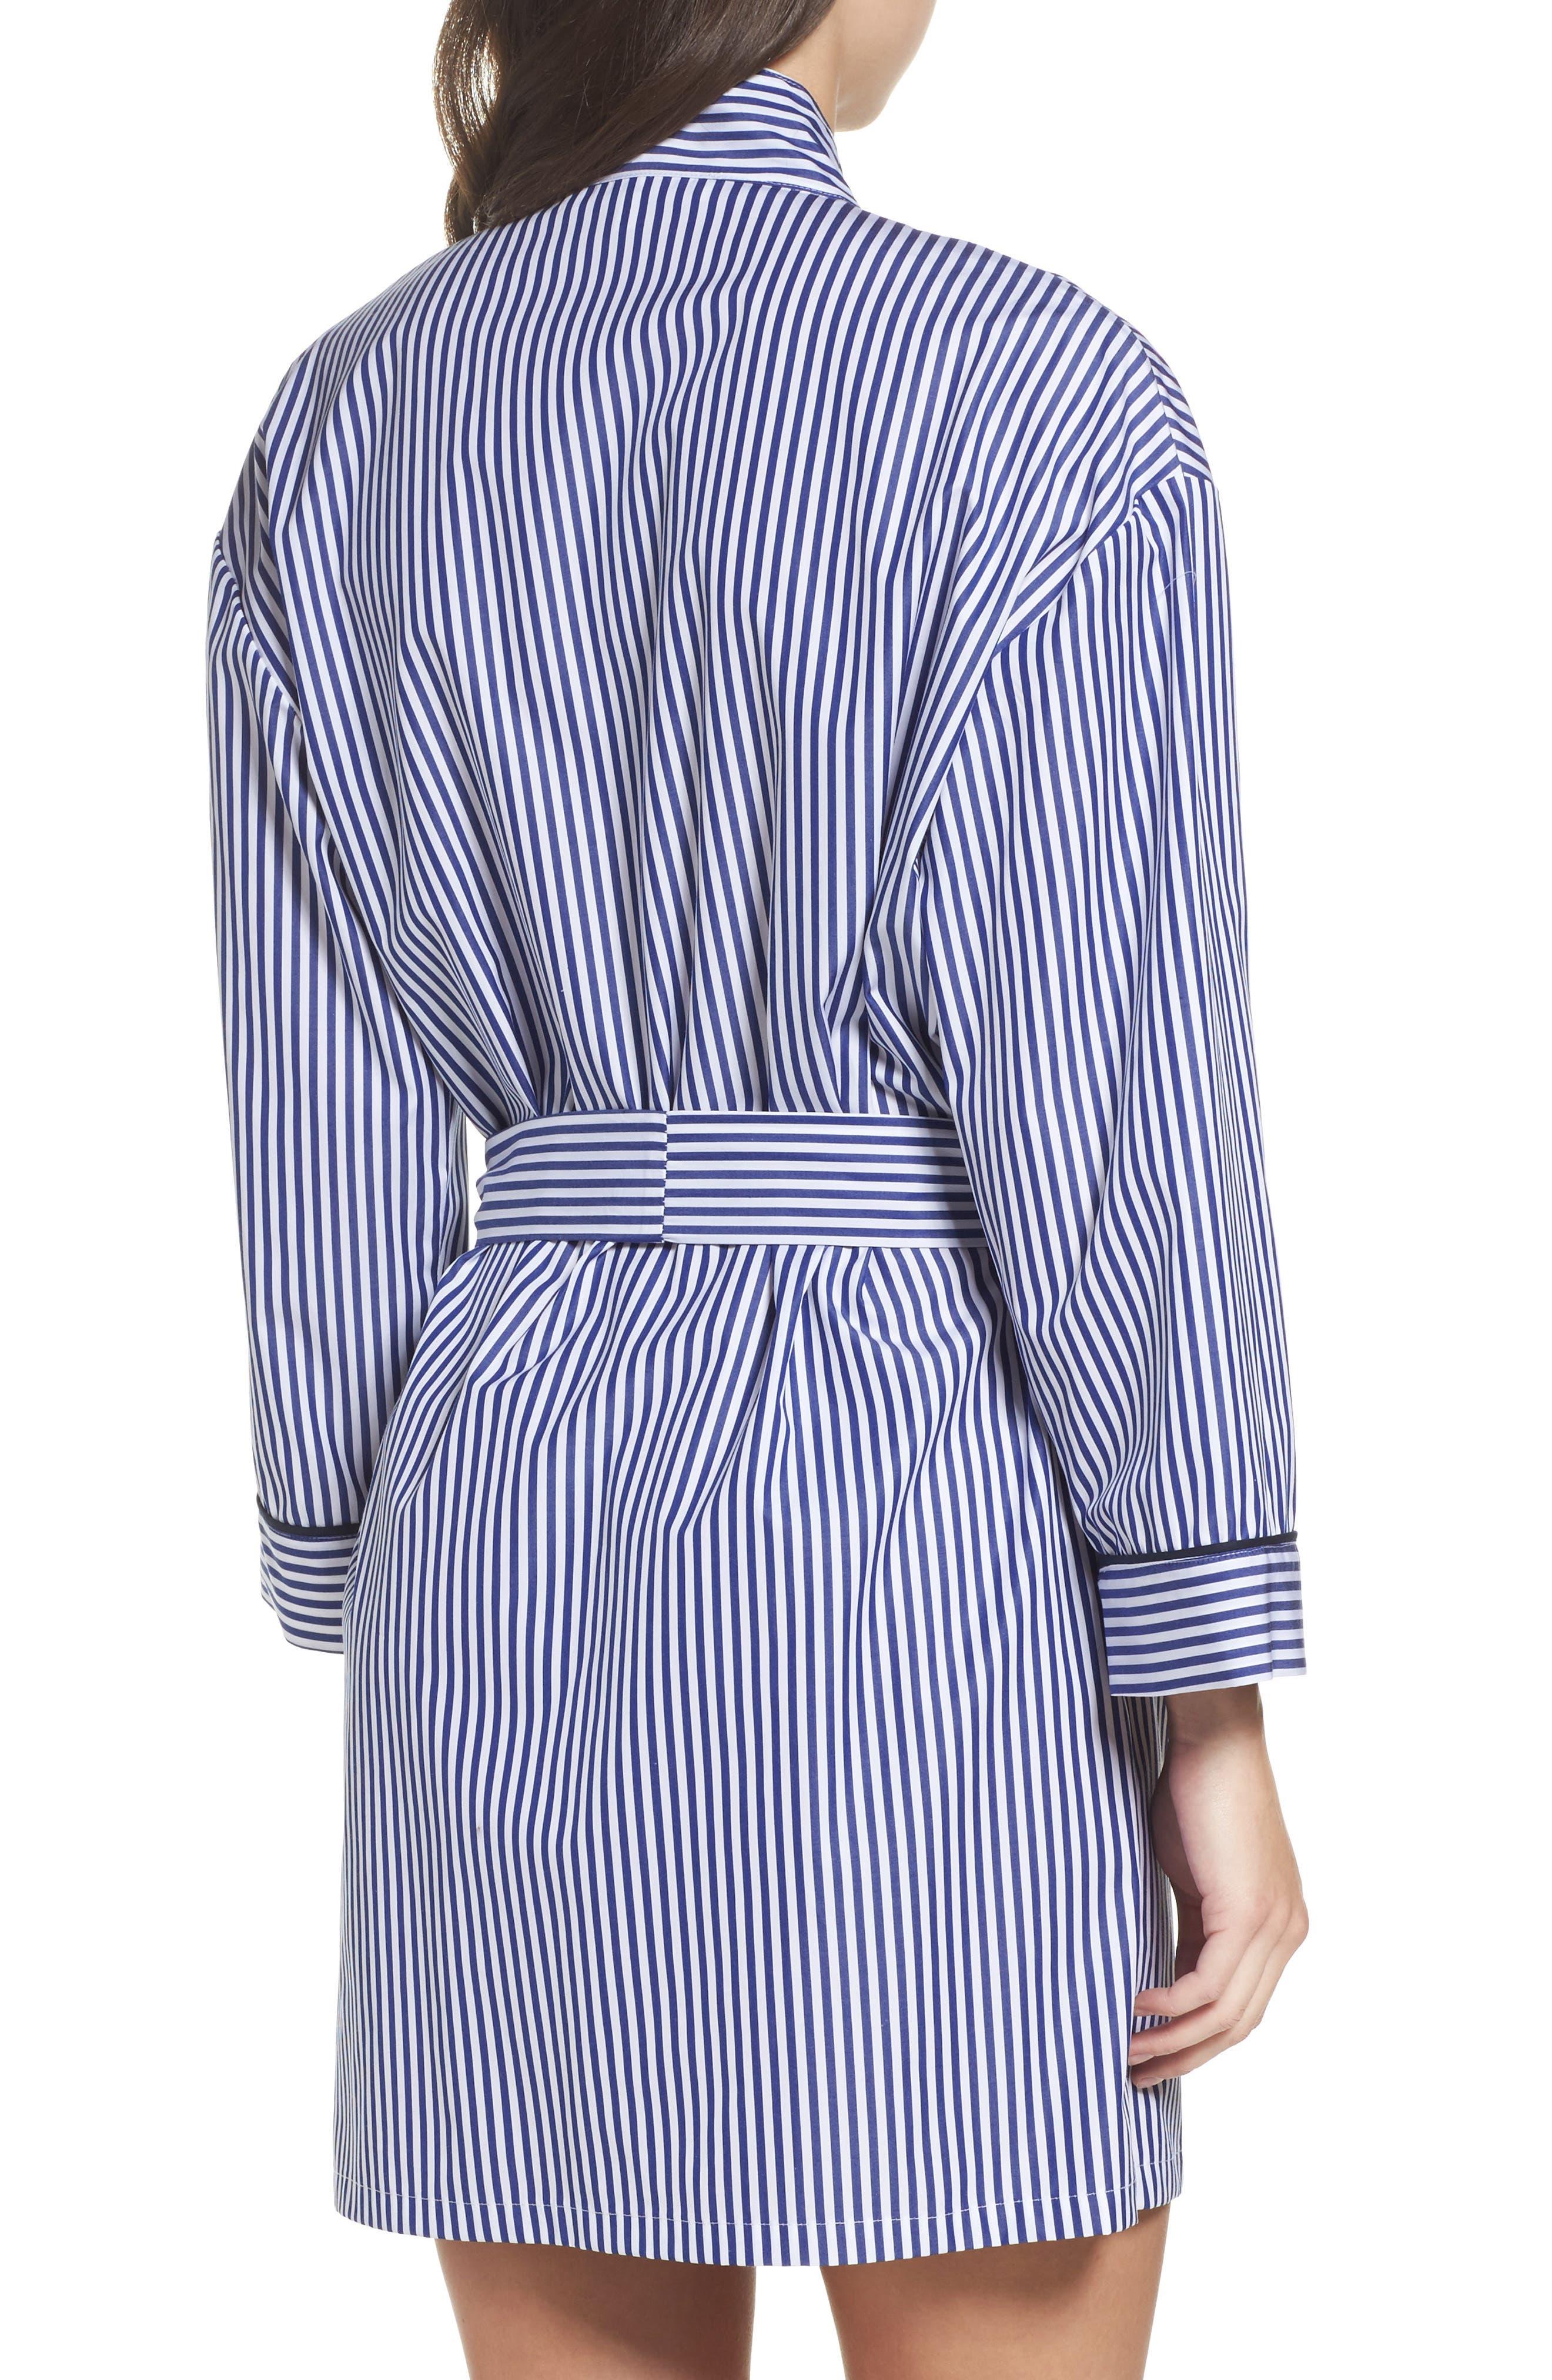 Stripe Robe,                             Alternate thumbnail 2, color,                             400